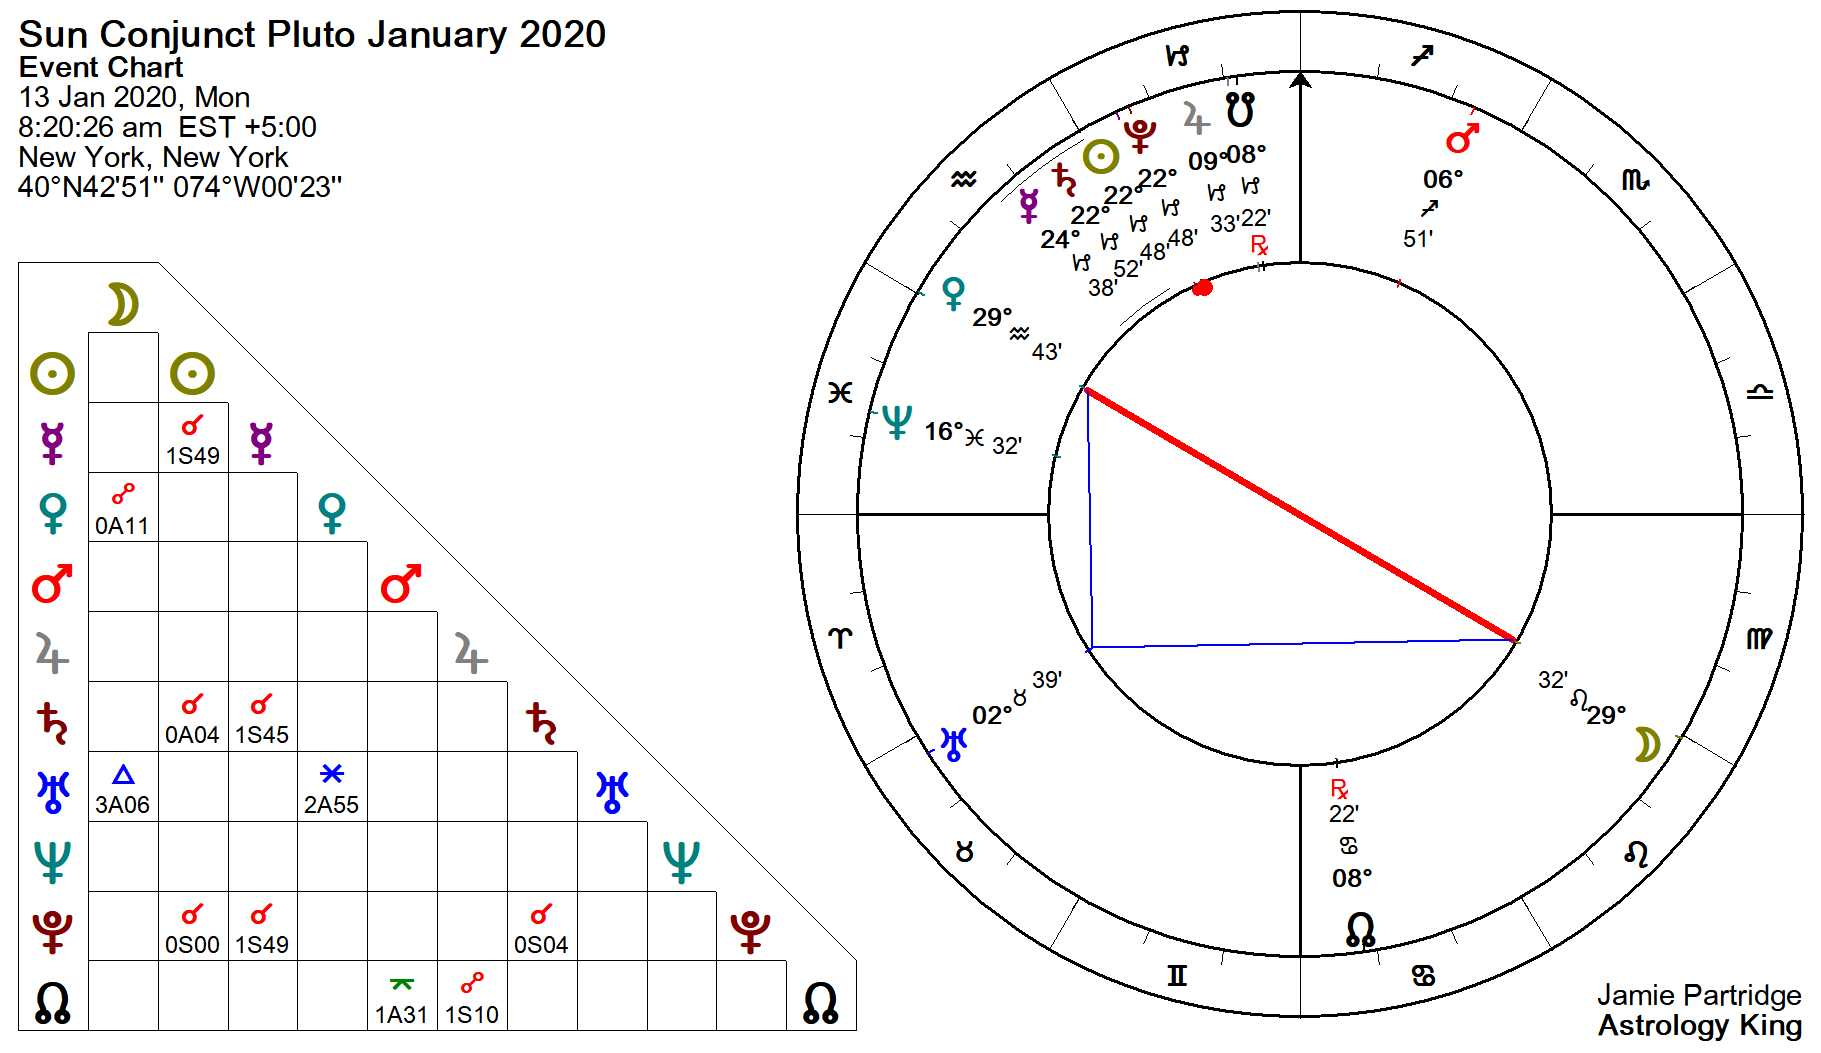 Sun Conjunct Pluto January 13, 2020 – Astrology King